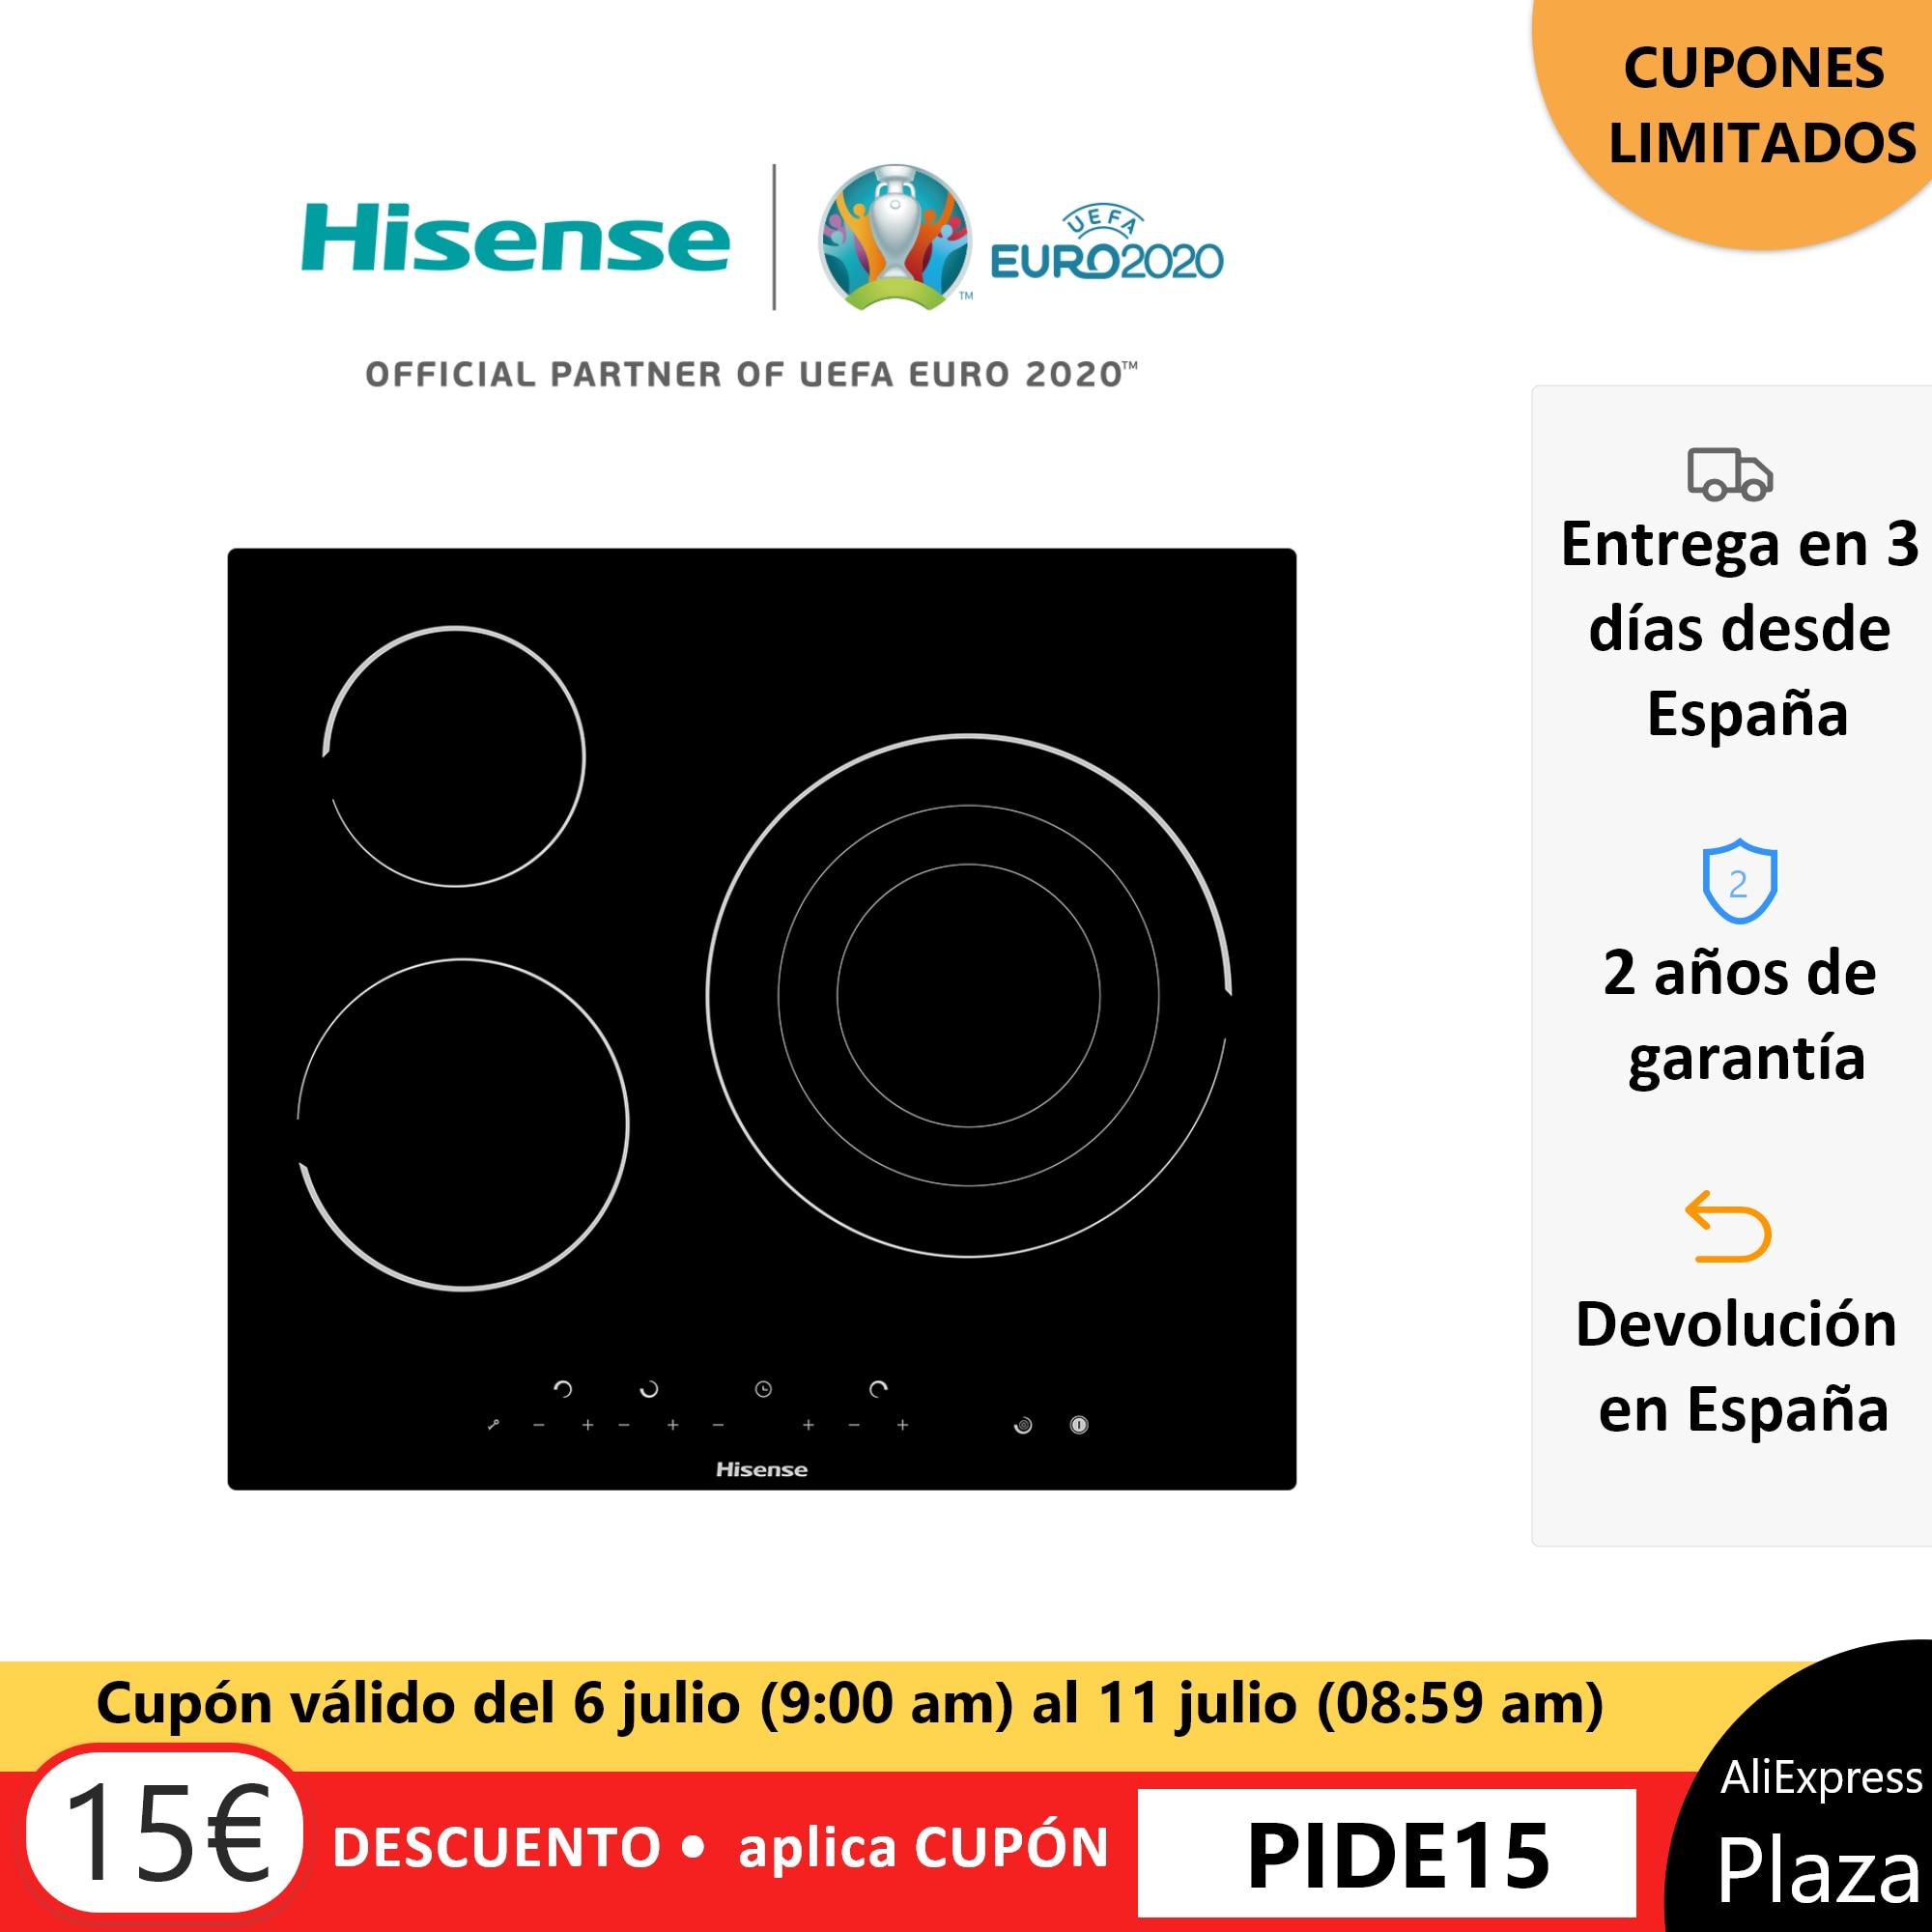 Hisense E6322C Ceramic Hob Top, Ceramic Glass Panel, 3 Burners, 5700 W, 59 × 6 × 52 Cm